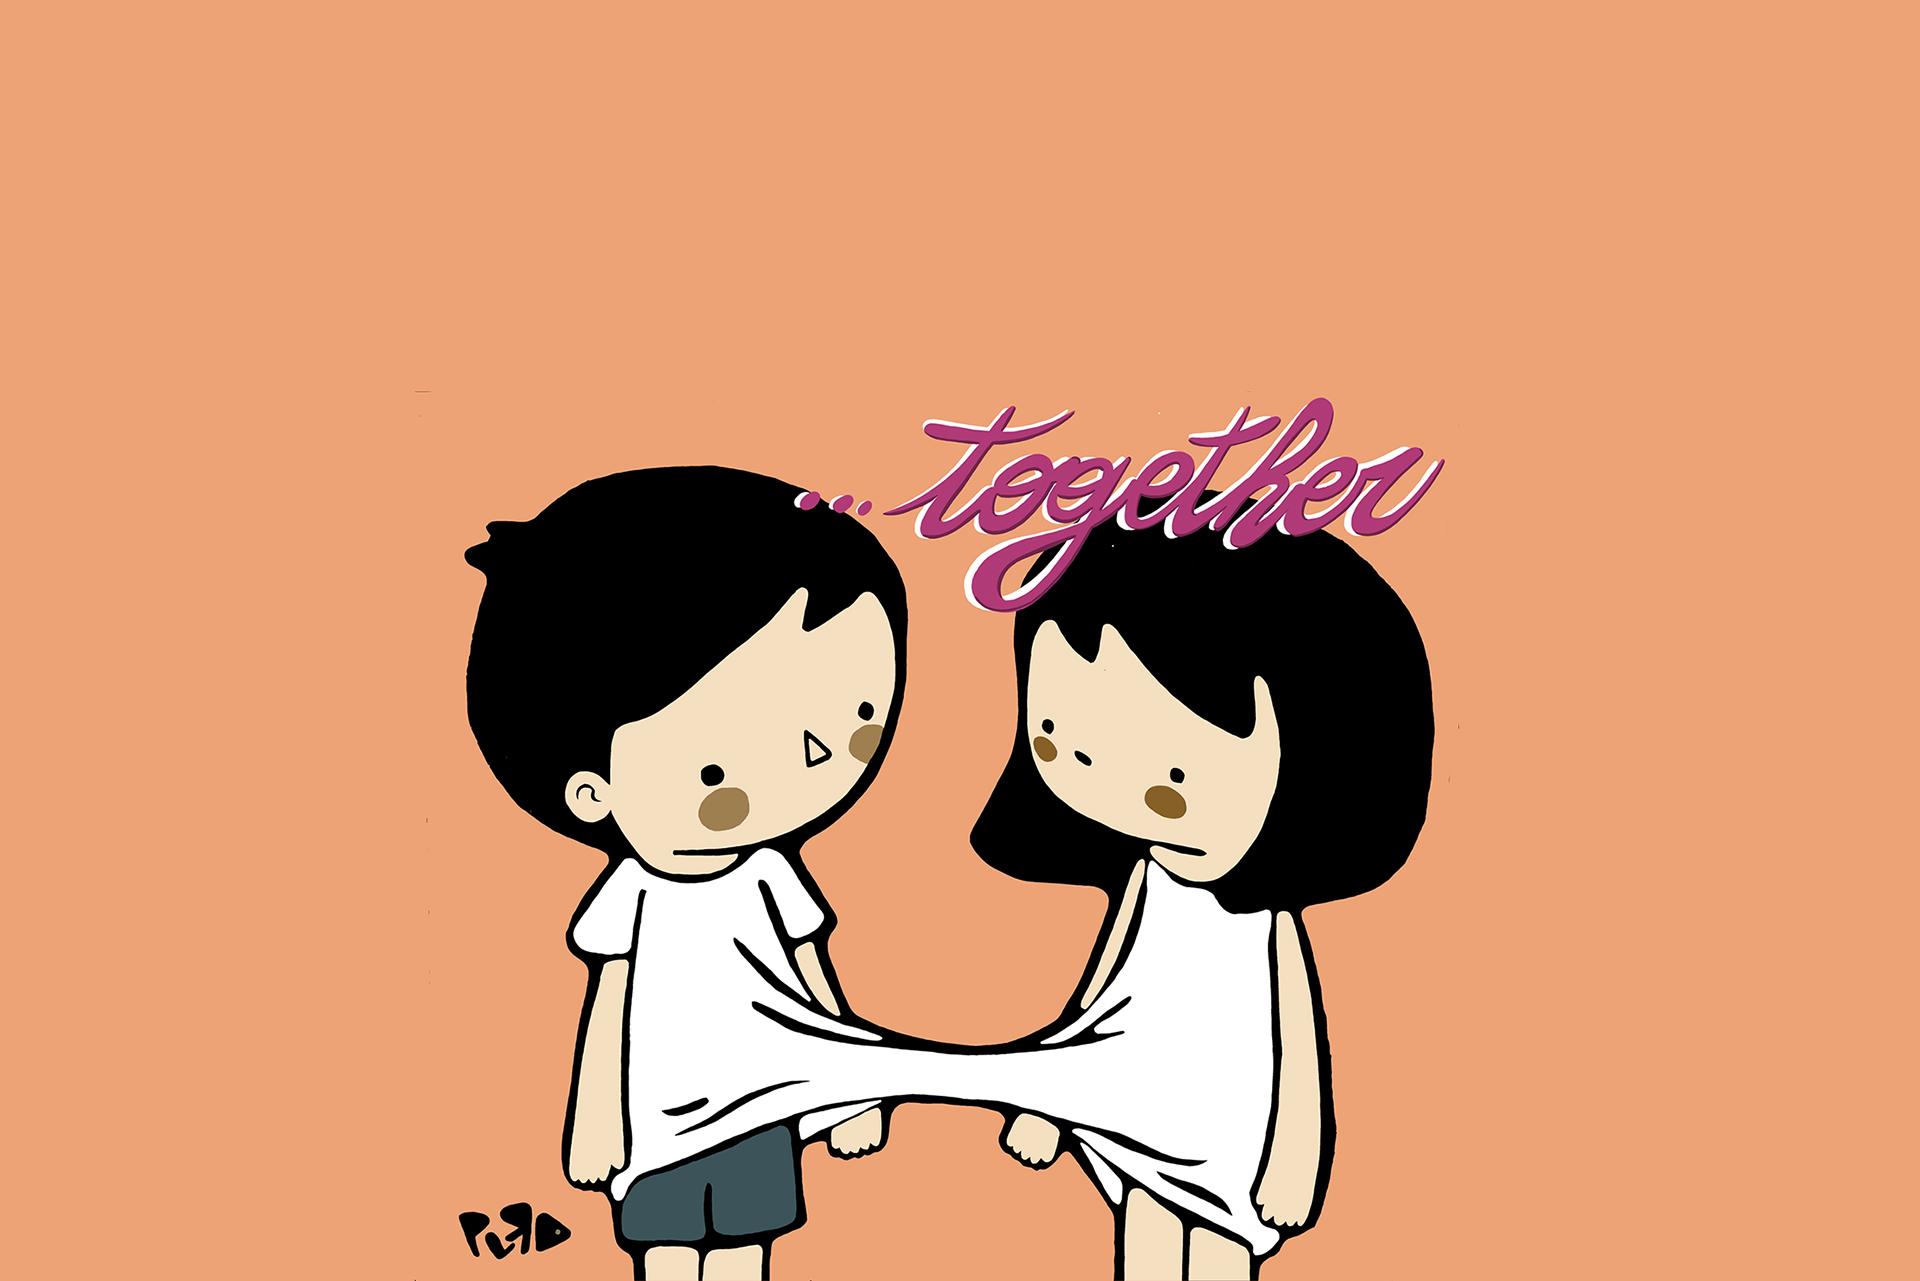 puro together